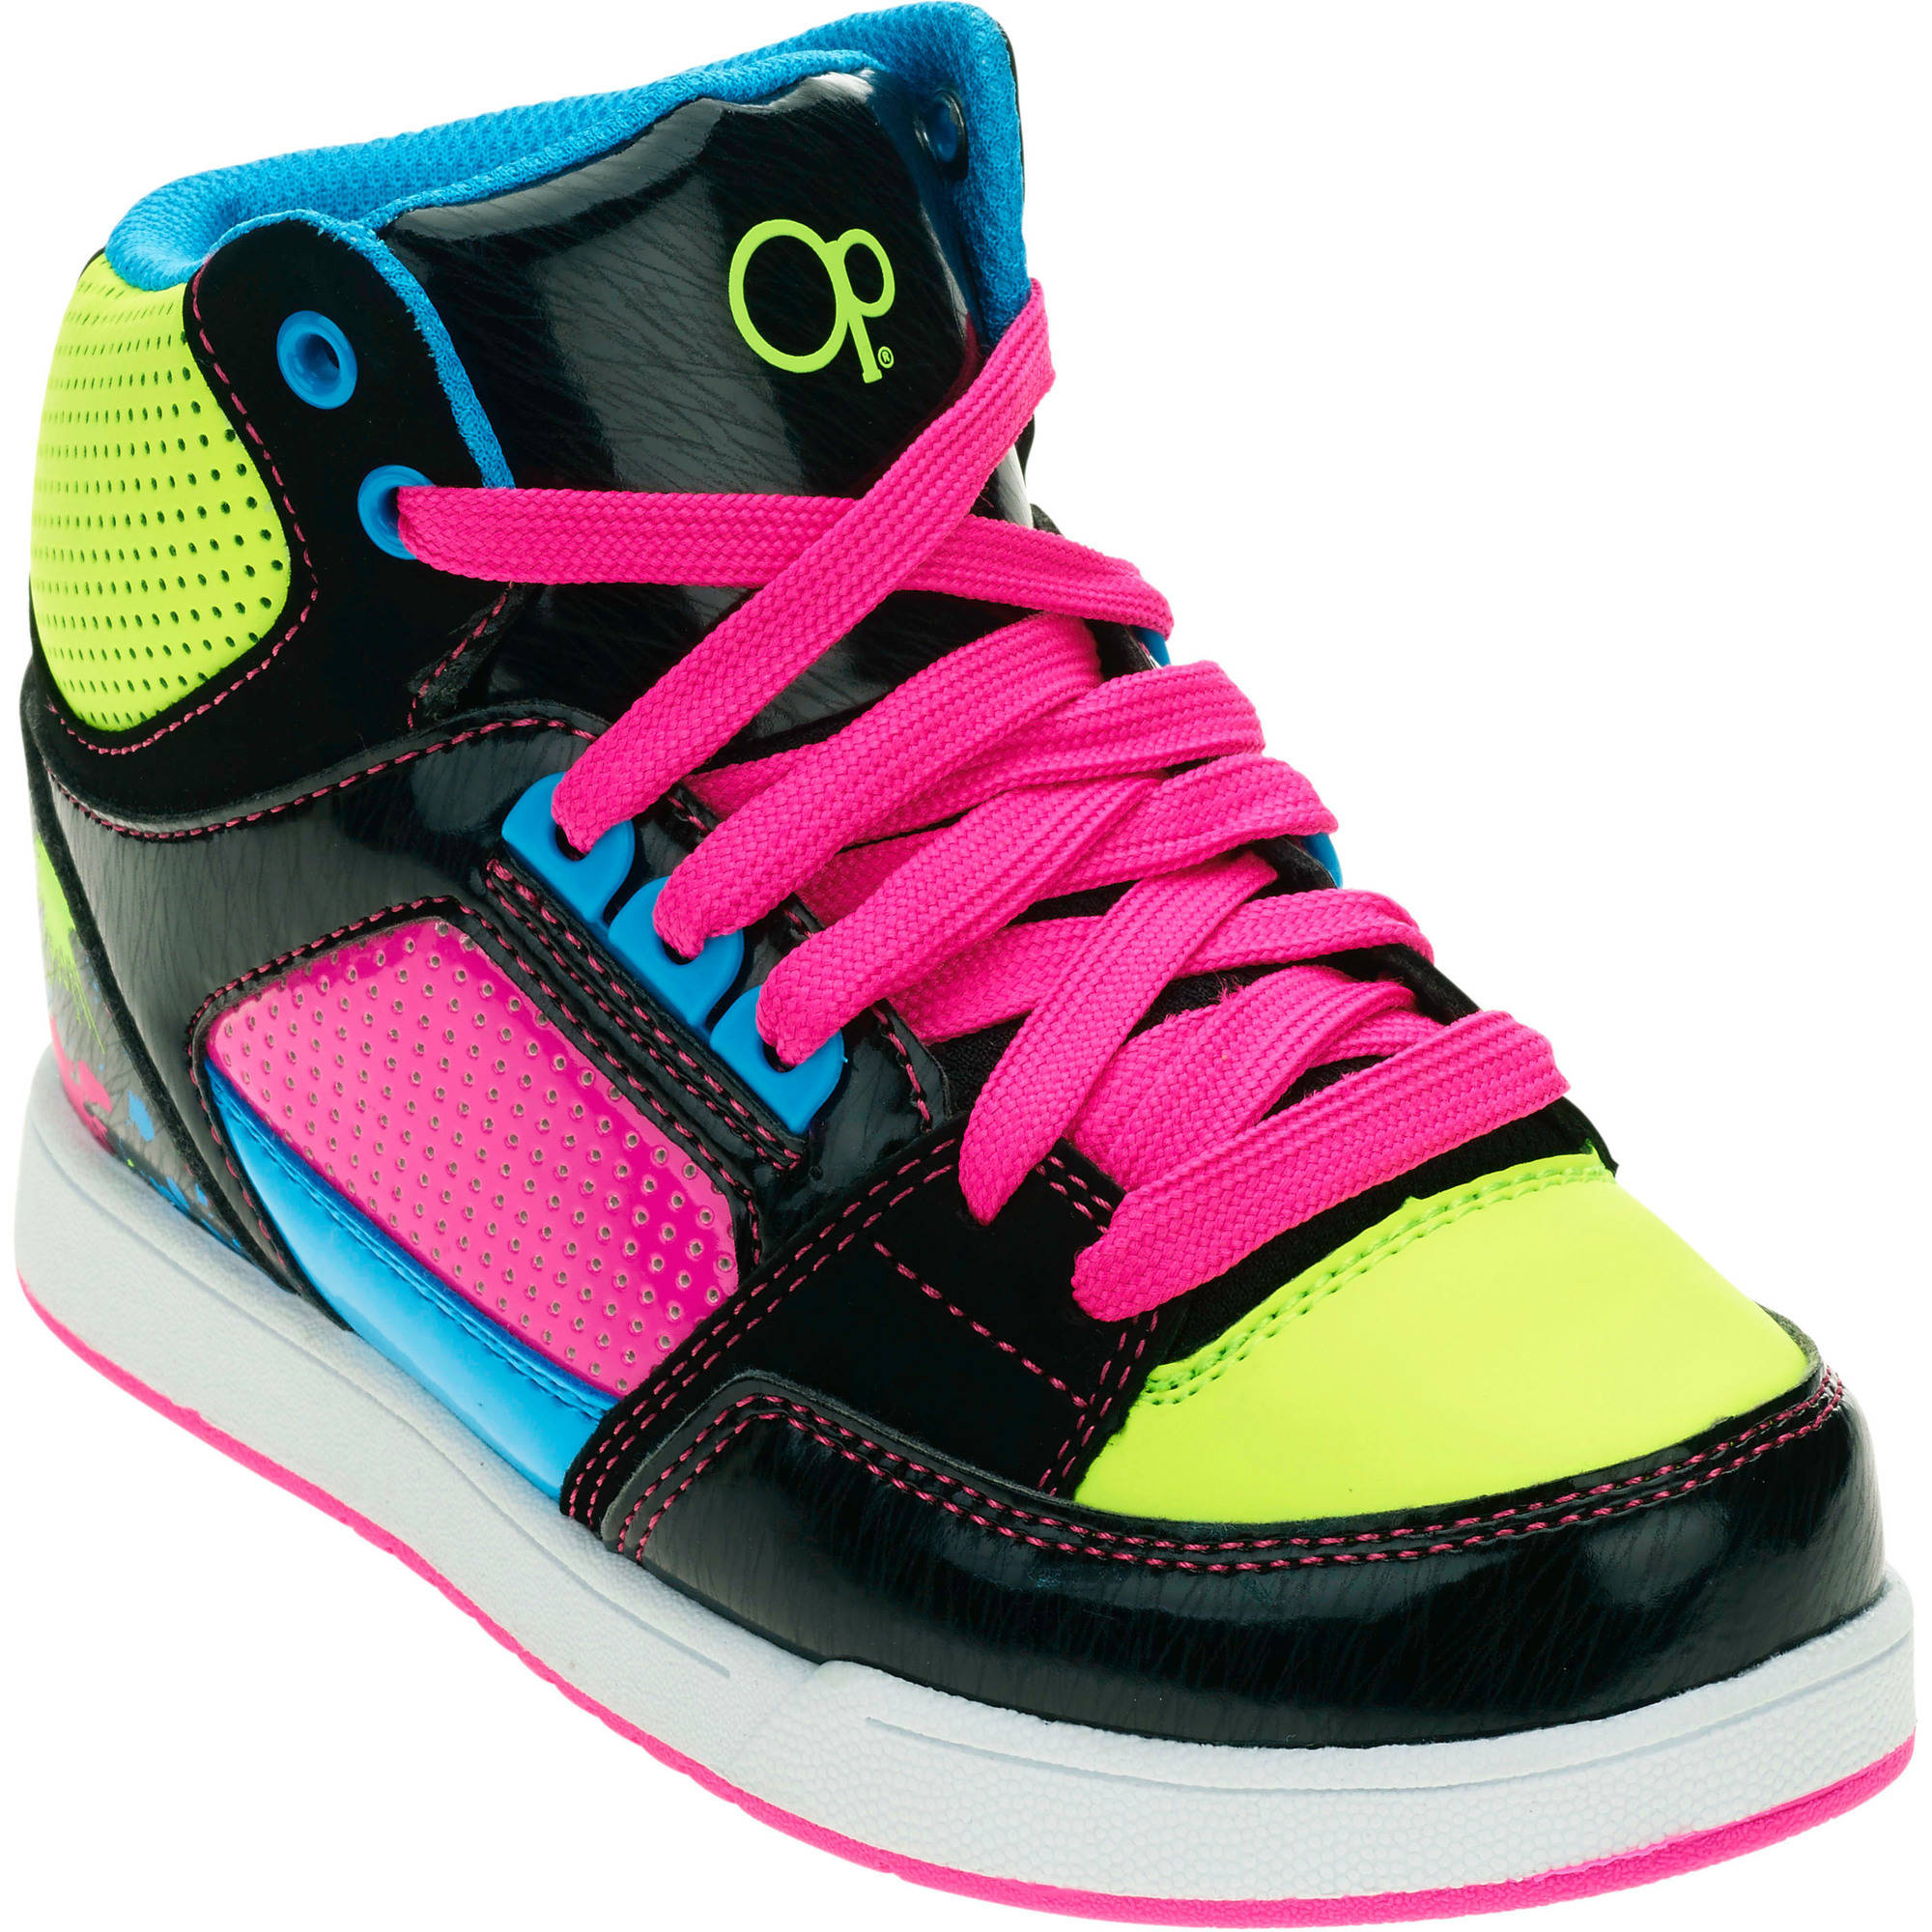 Ocean Pacific Girls Fashion Skate Athletic Shoe